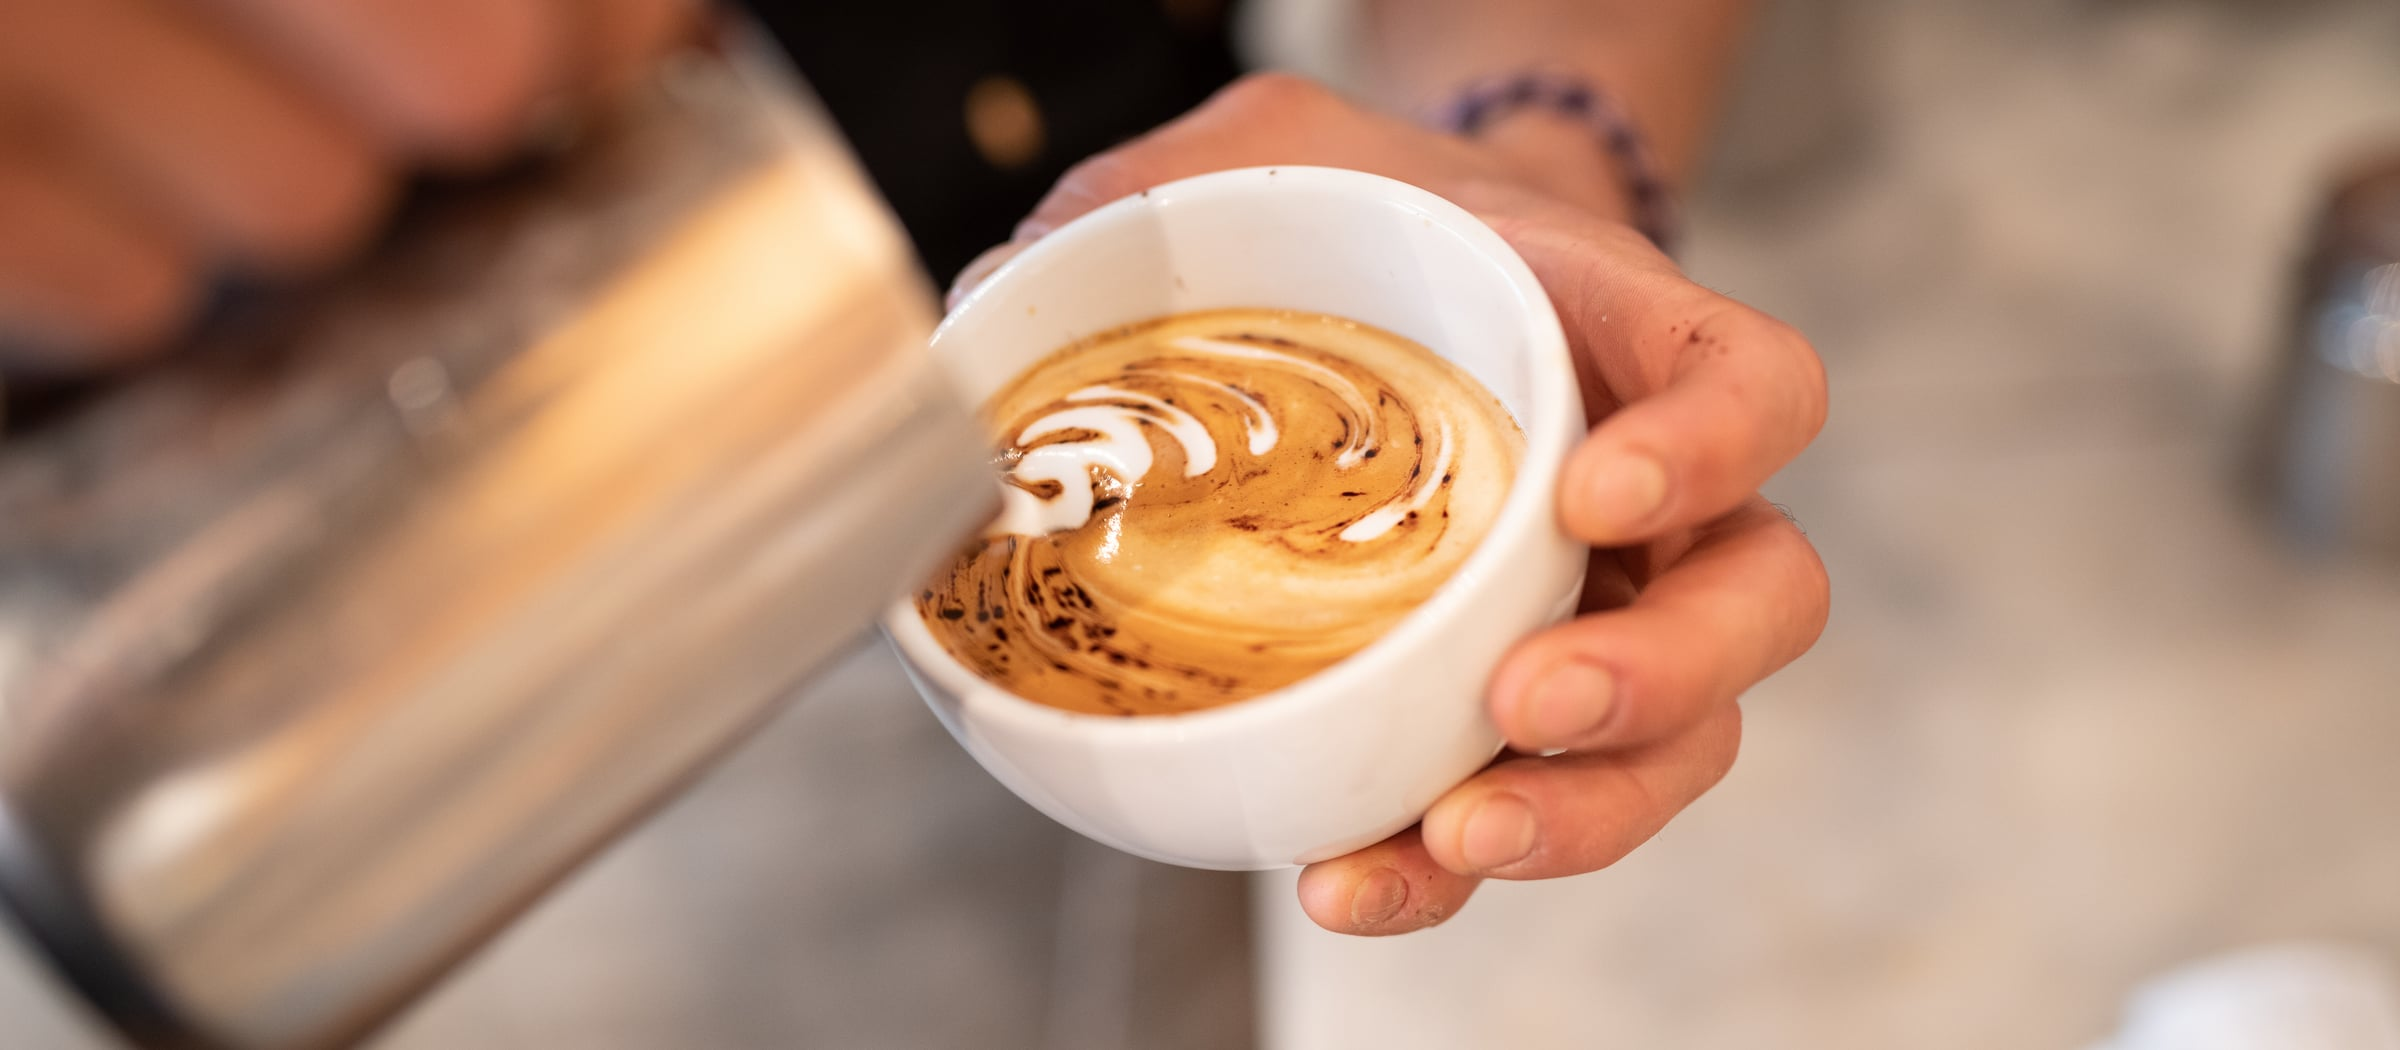 Pistor Inspiration Babus Bakery Coffeehouse Kaffee Tasse